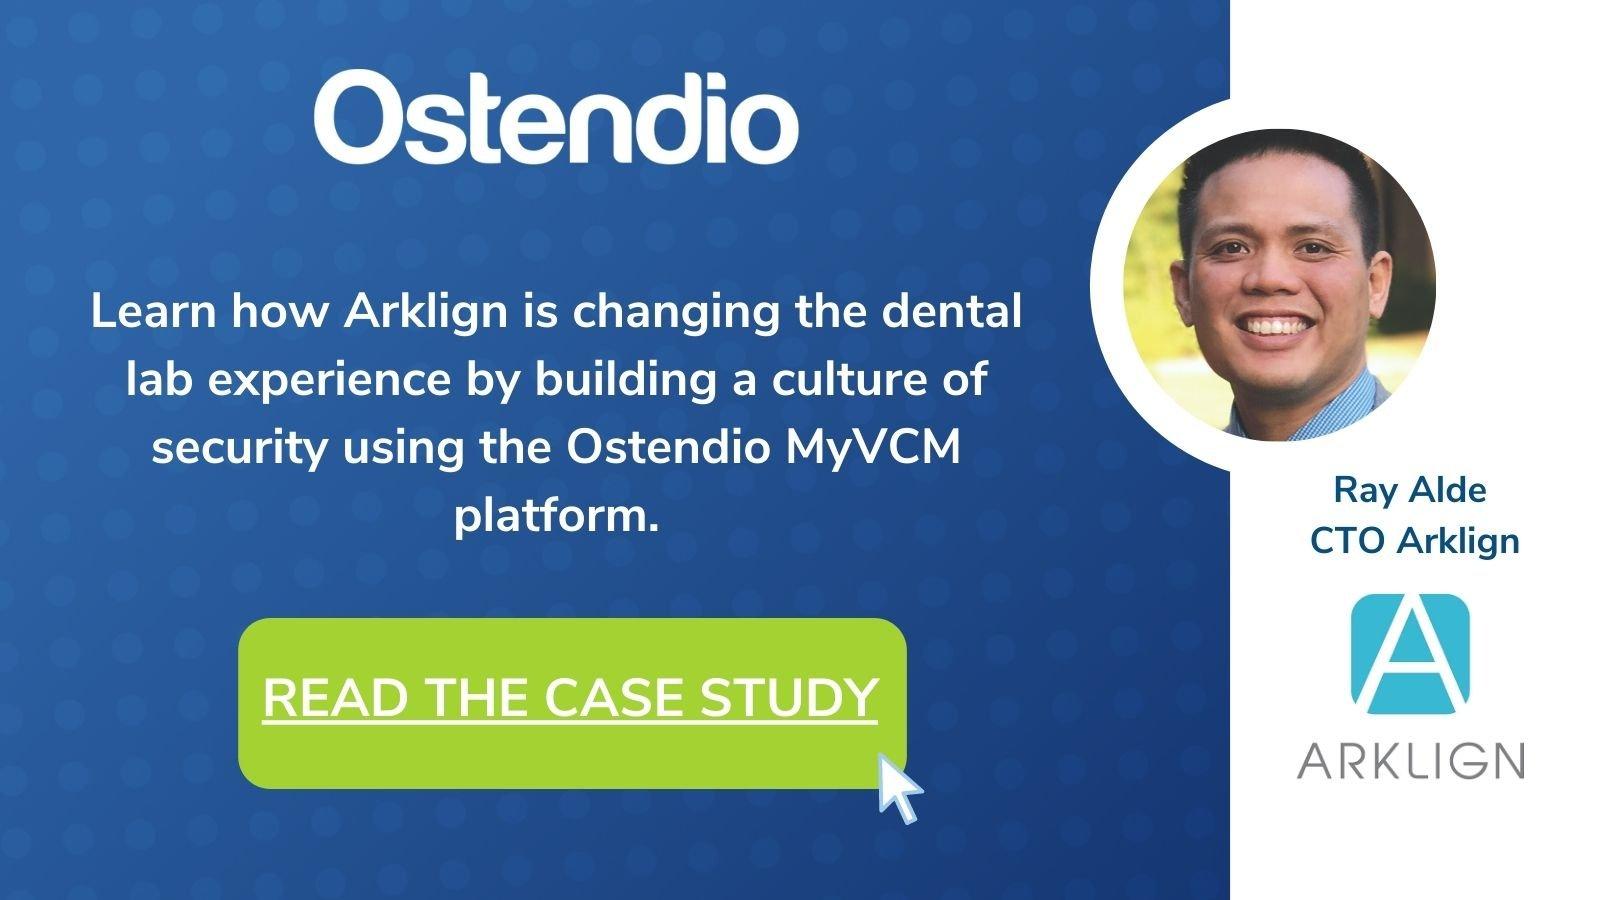 Arklign READ THE CASE STUDY